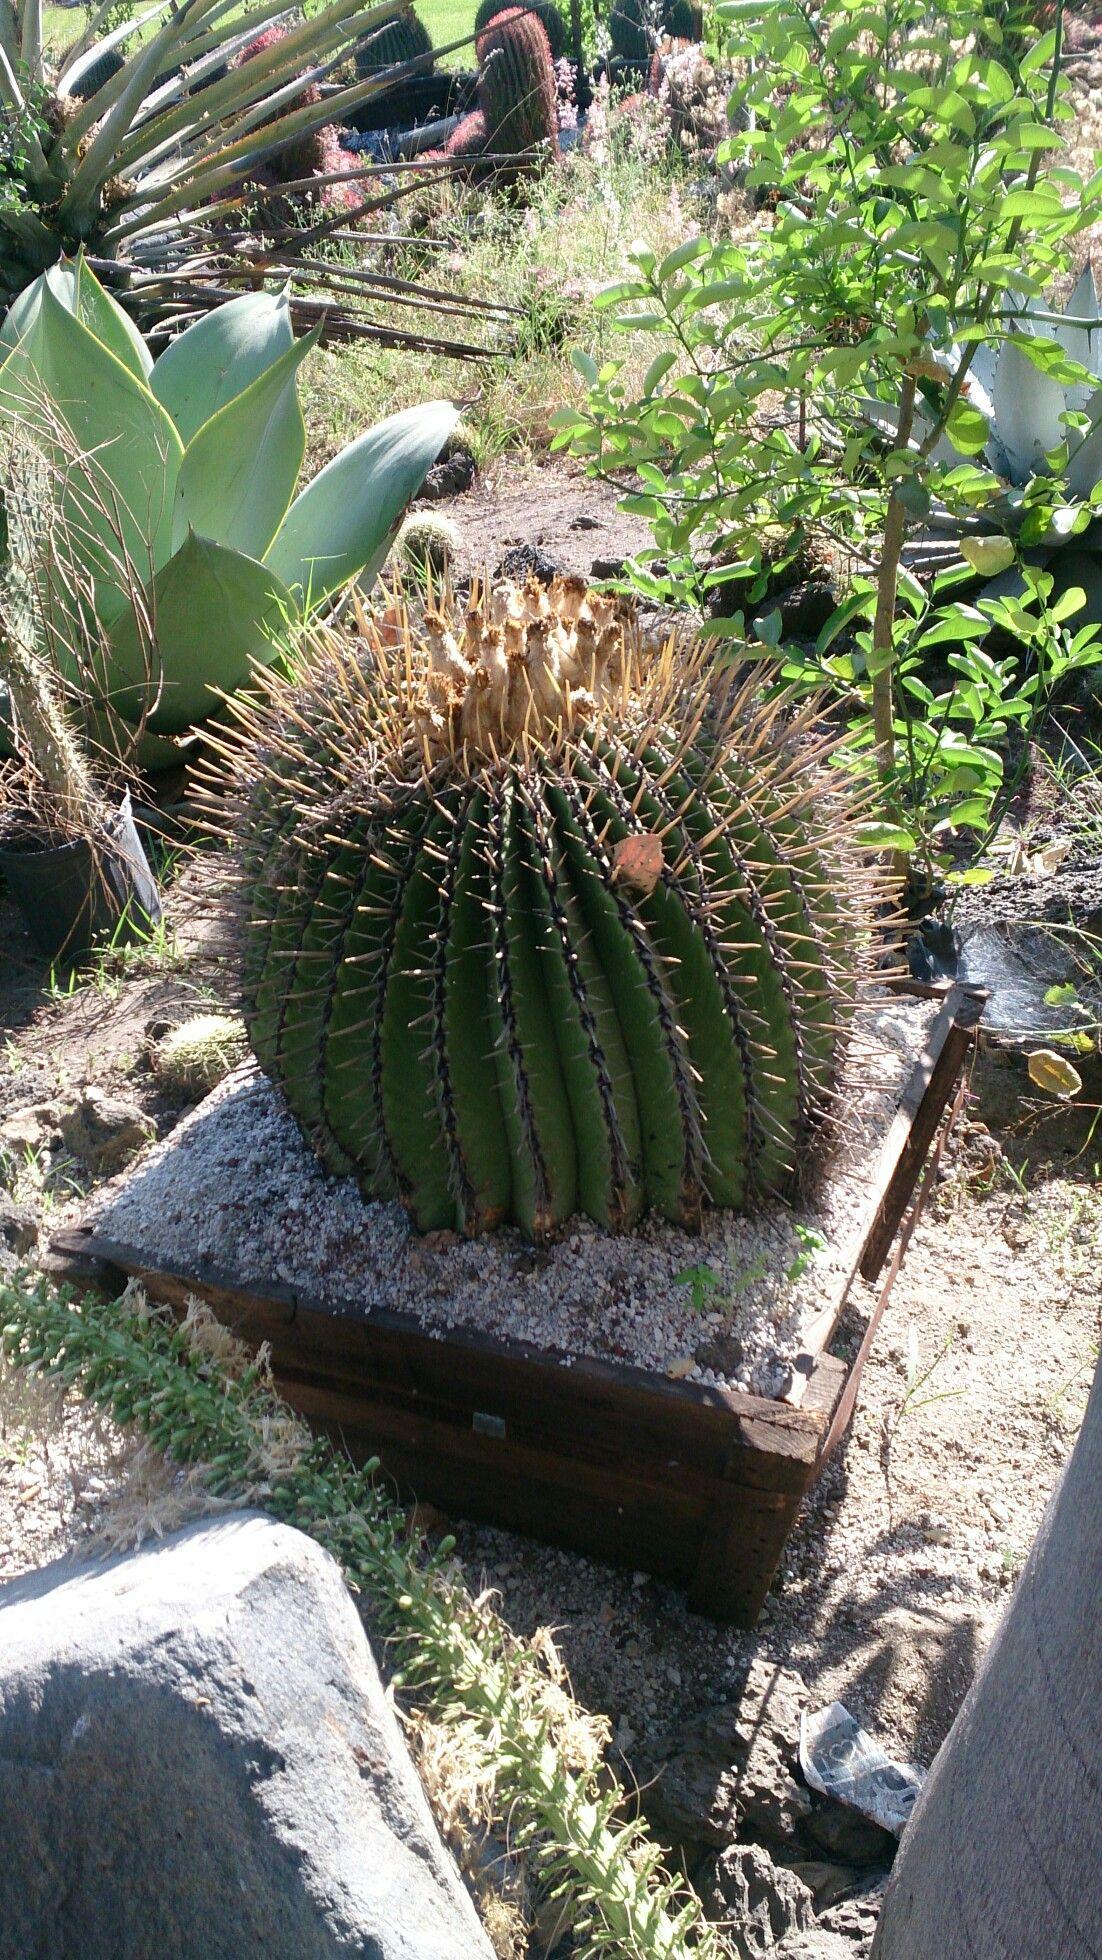 Pin by nahui ollin on Plantas y cactus